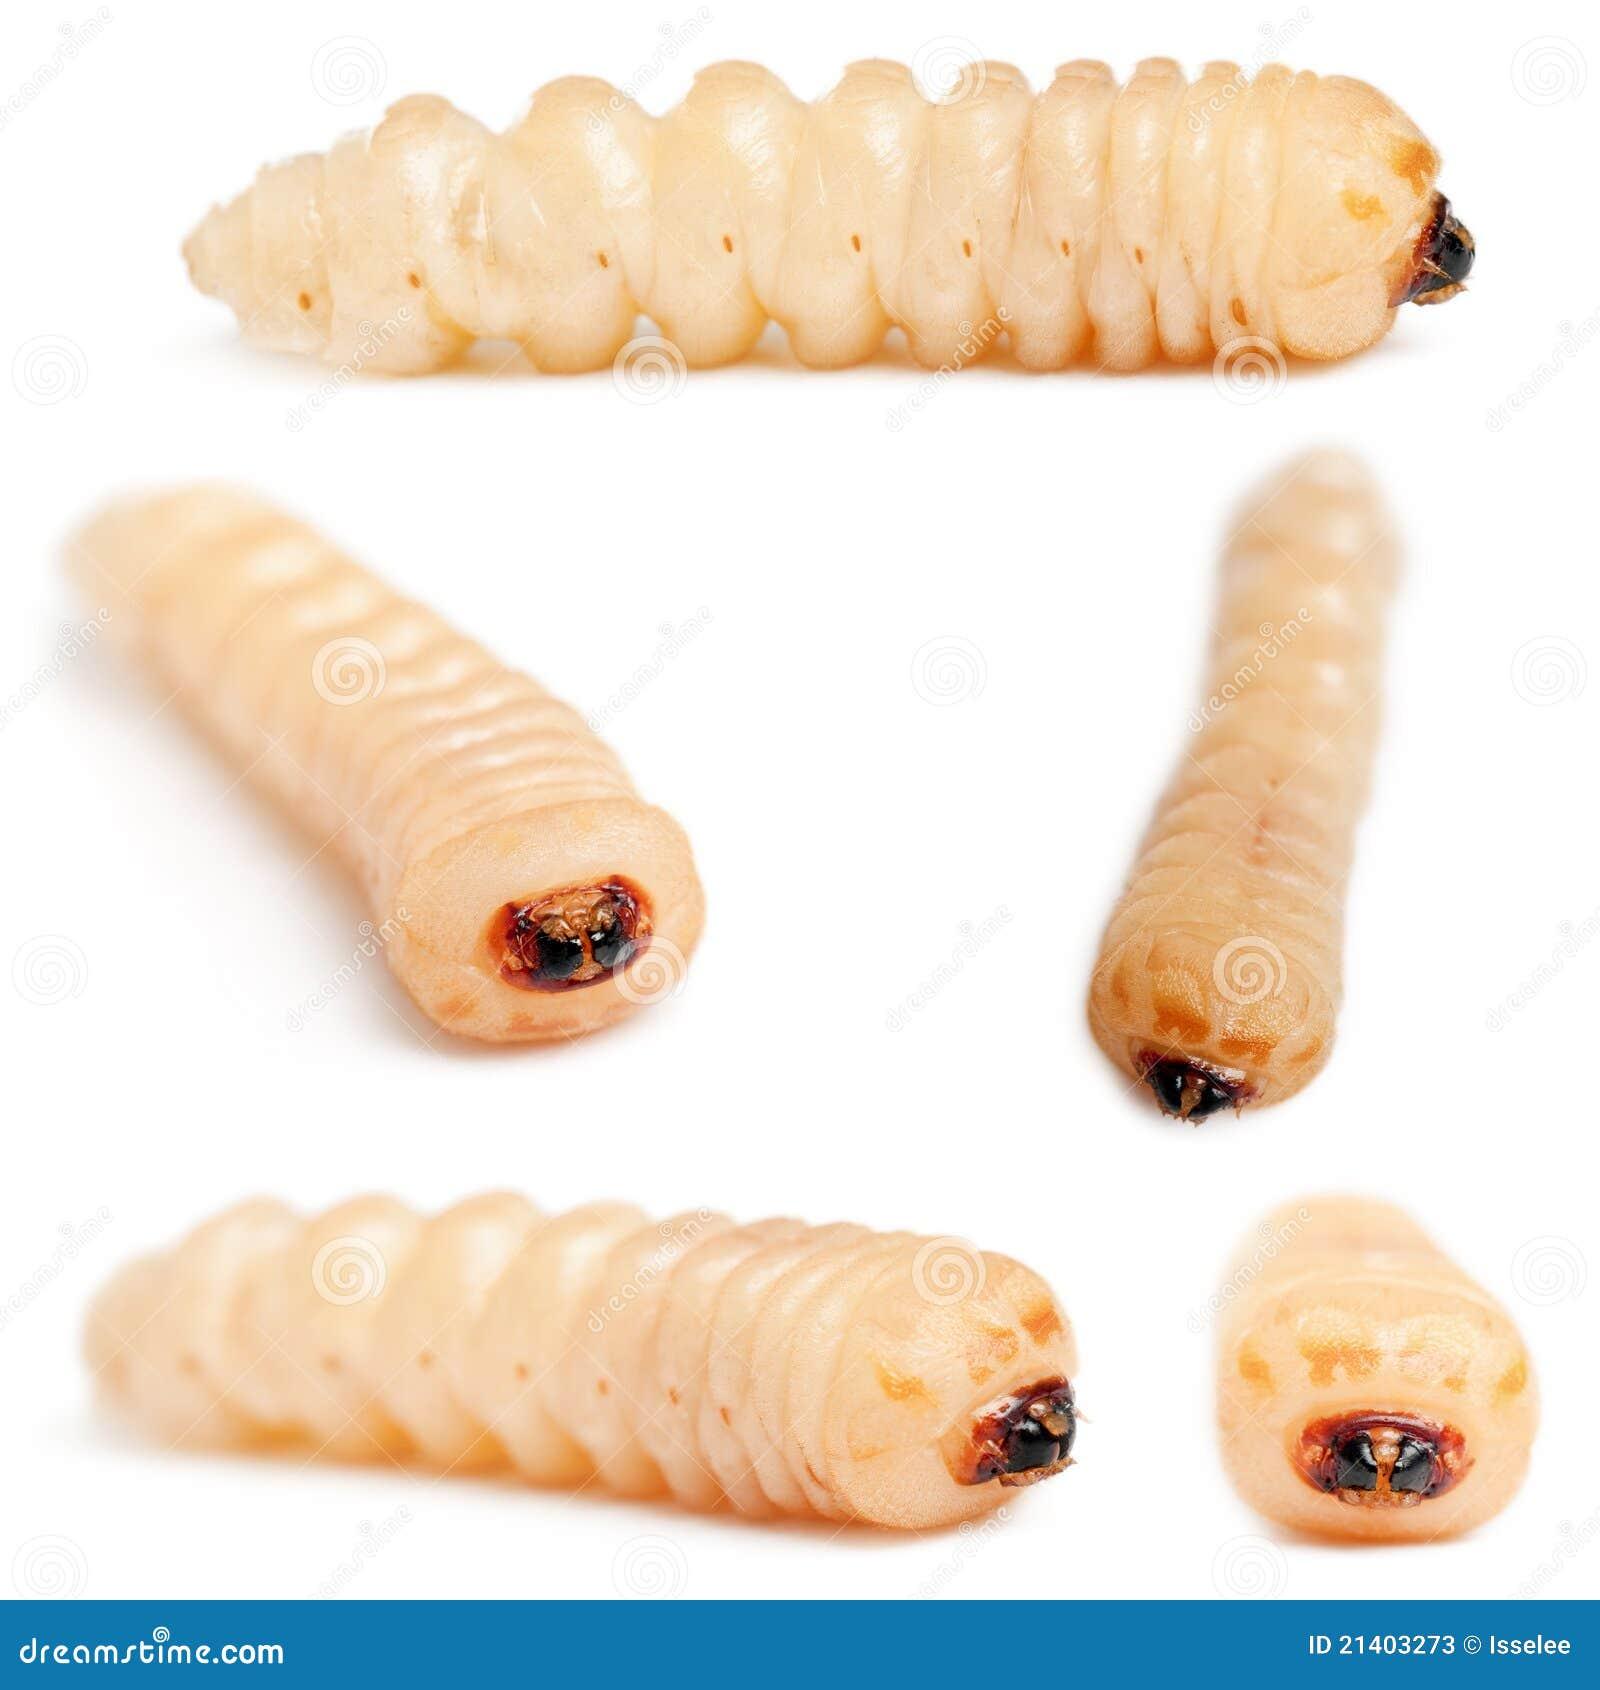 Larva de Cerambycidae Giant Longhorn Beetle Larva  Lab Entomologia Sistemática  UEL